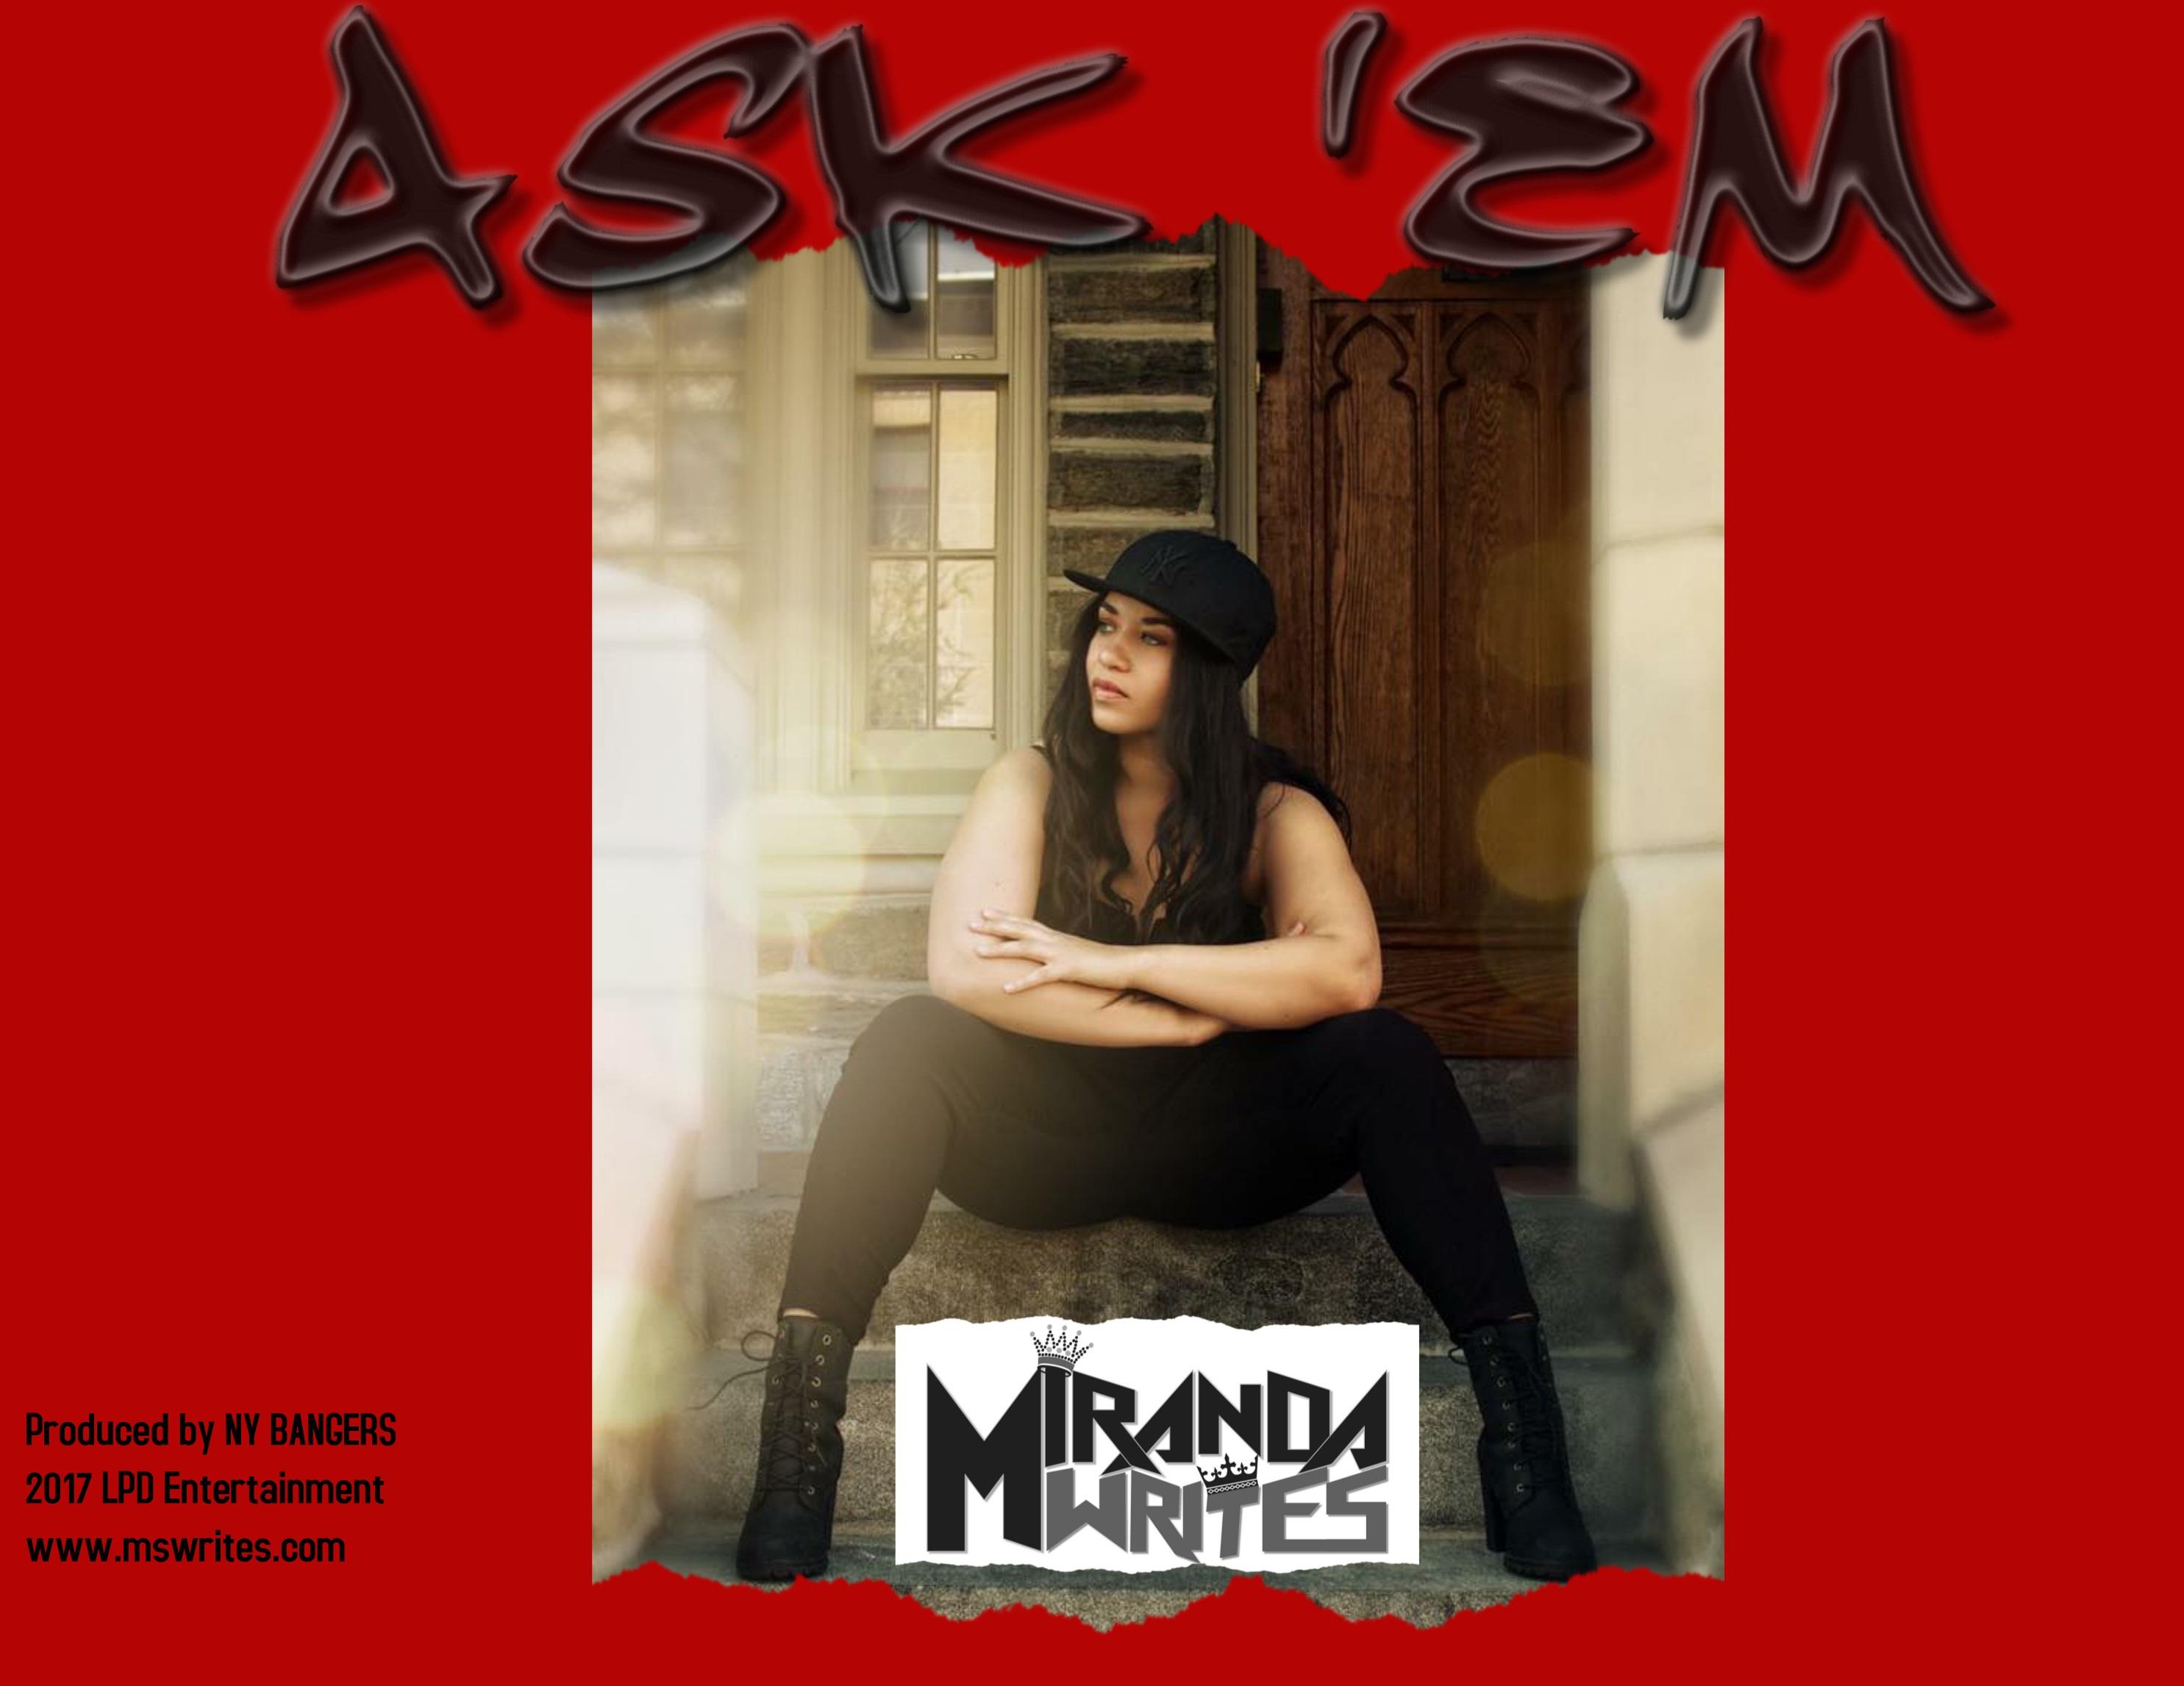 ask em photo art